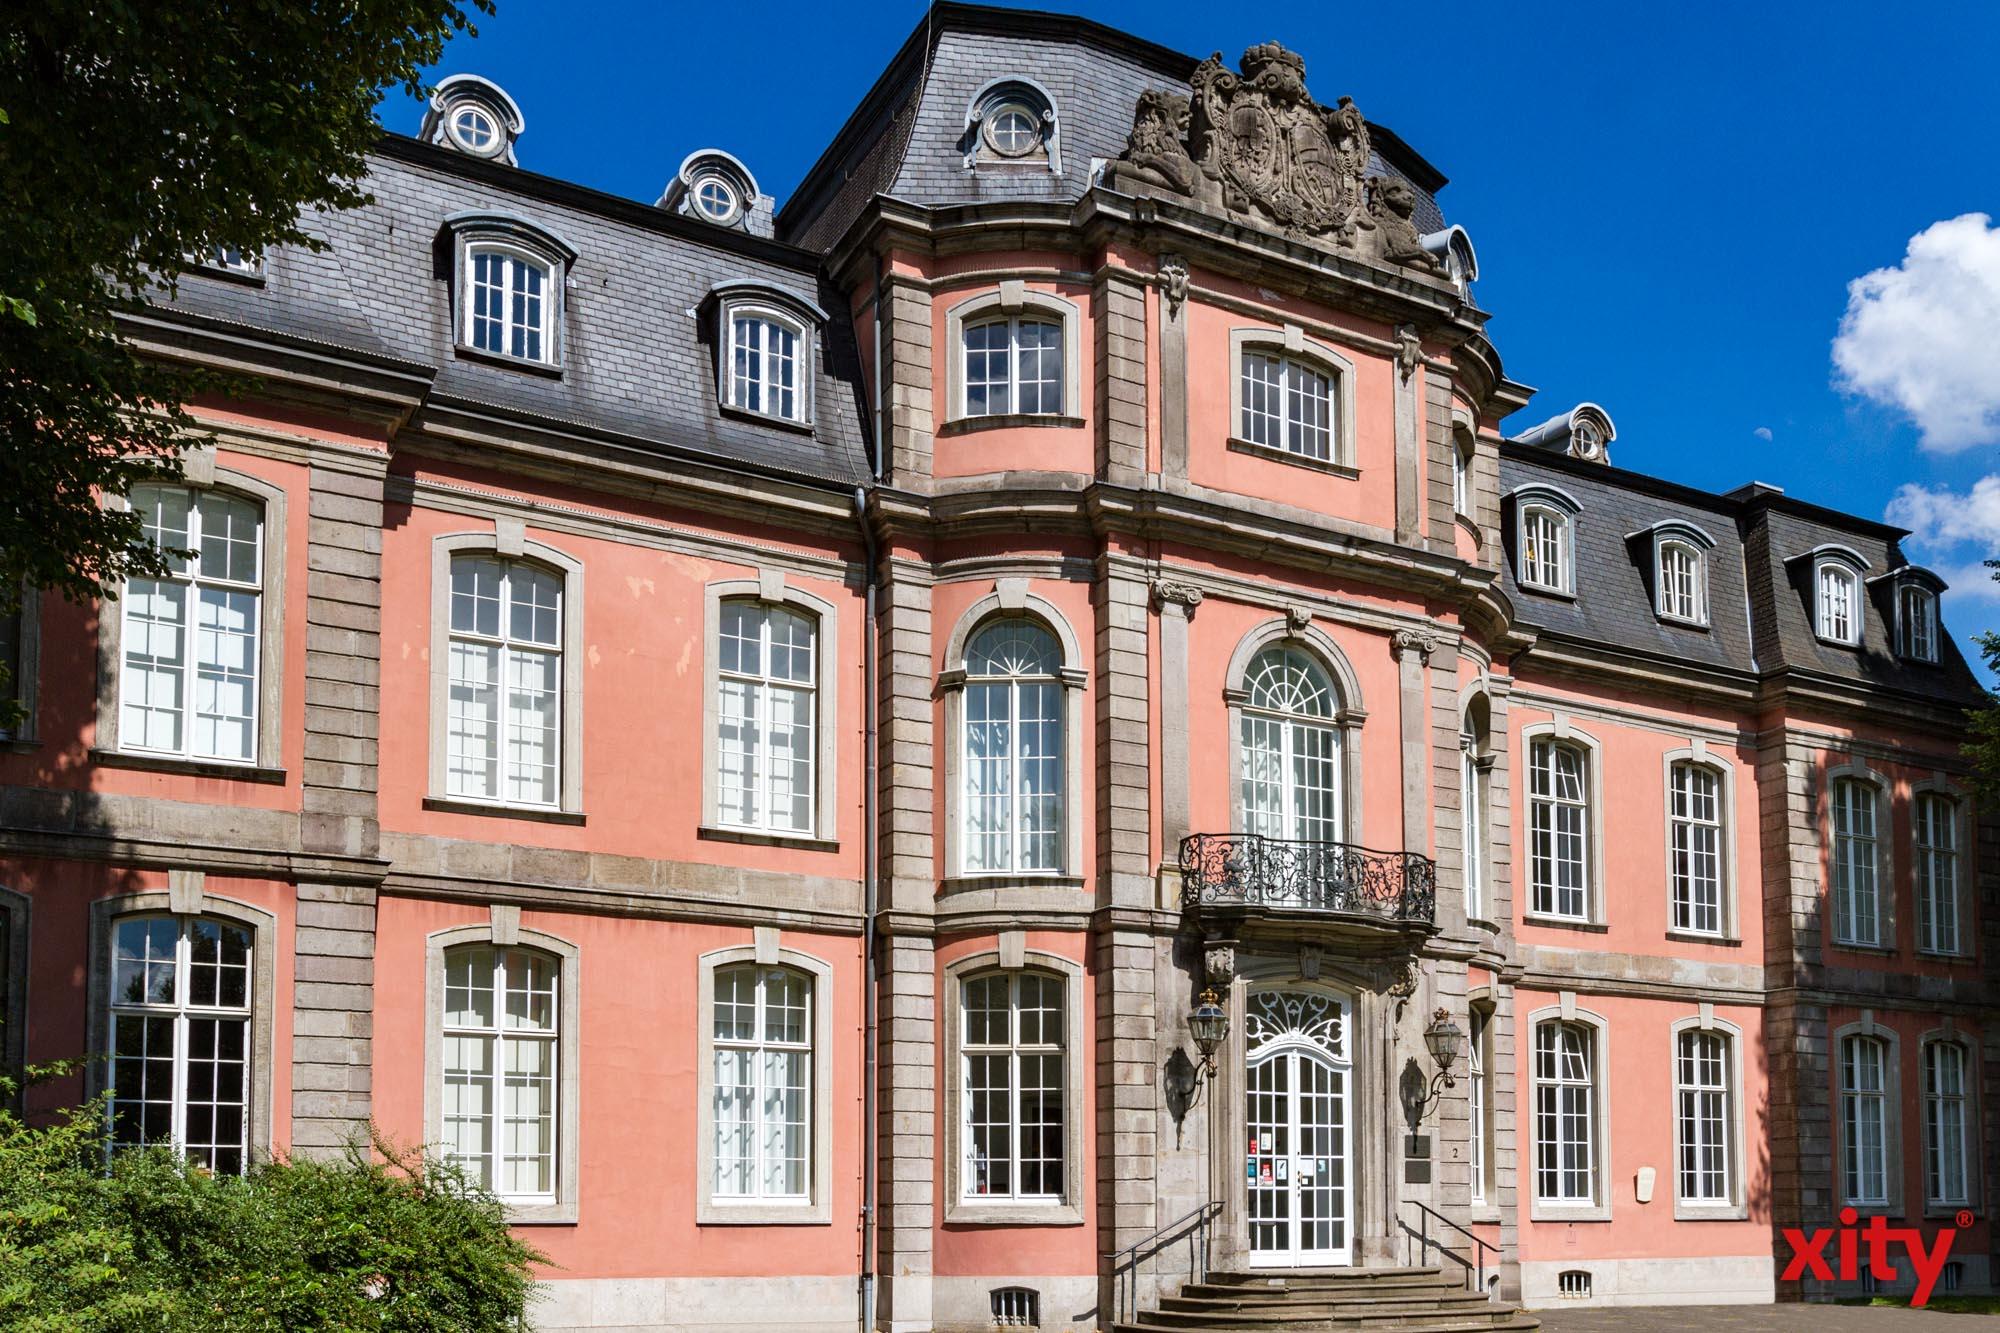 Literatur-Musik-Veranstaltung im Goethe-Museum Düsseldorf (Foto: xity)